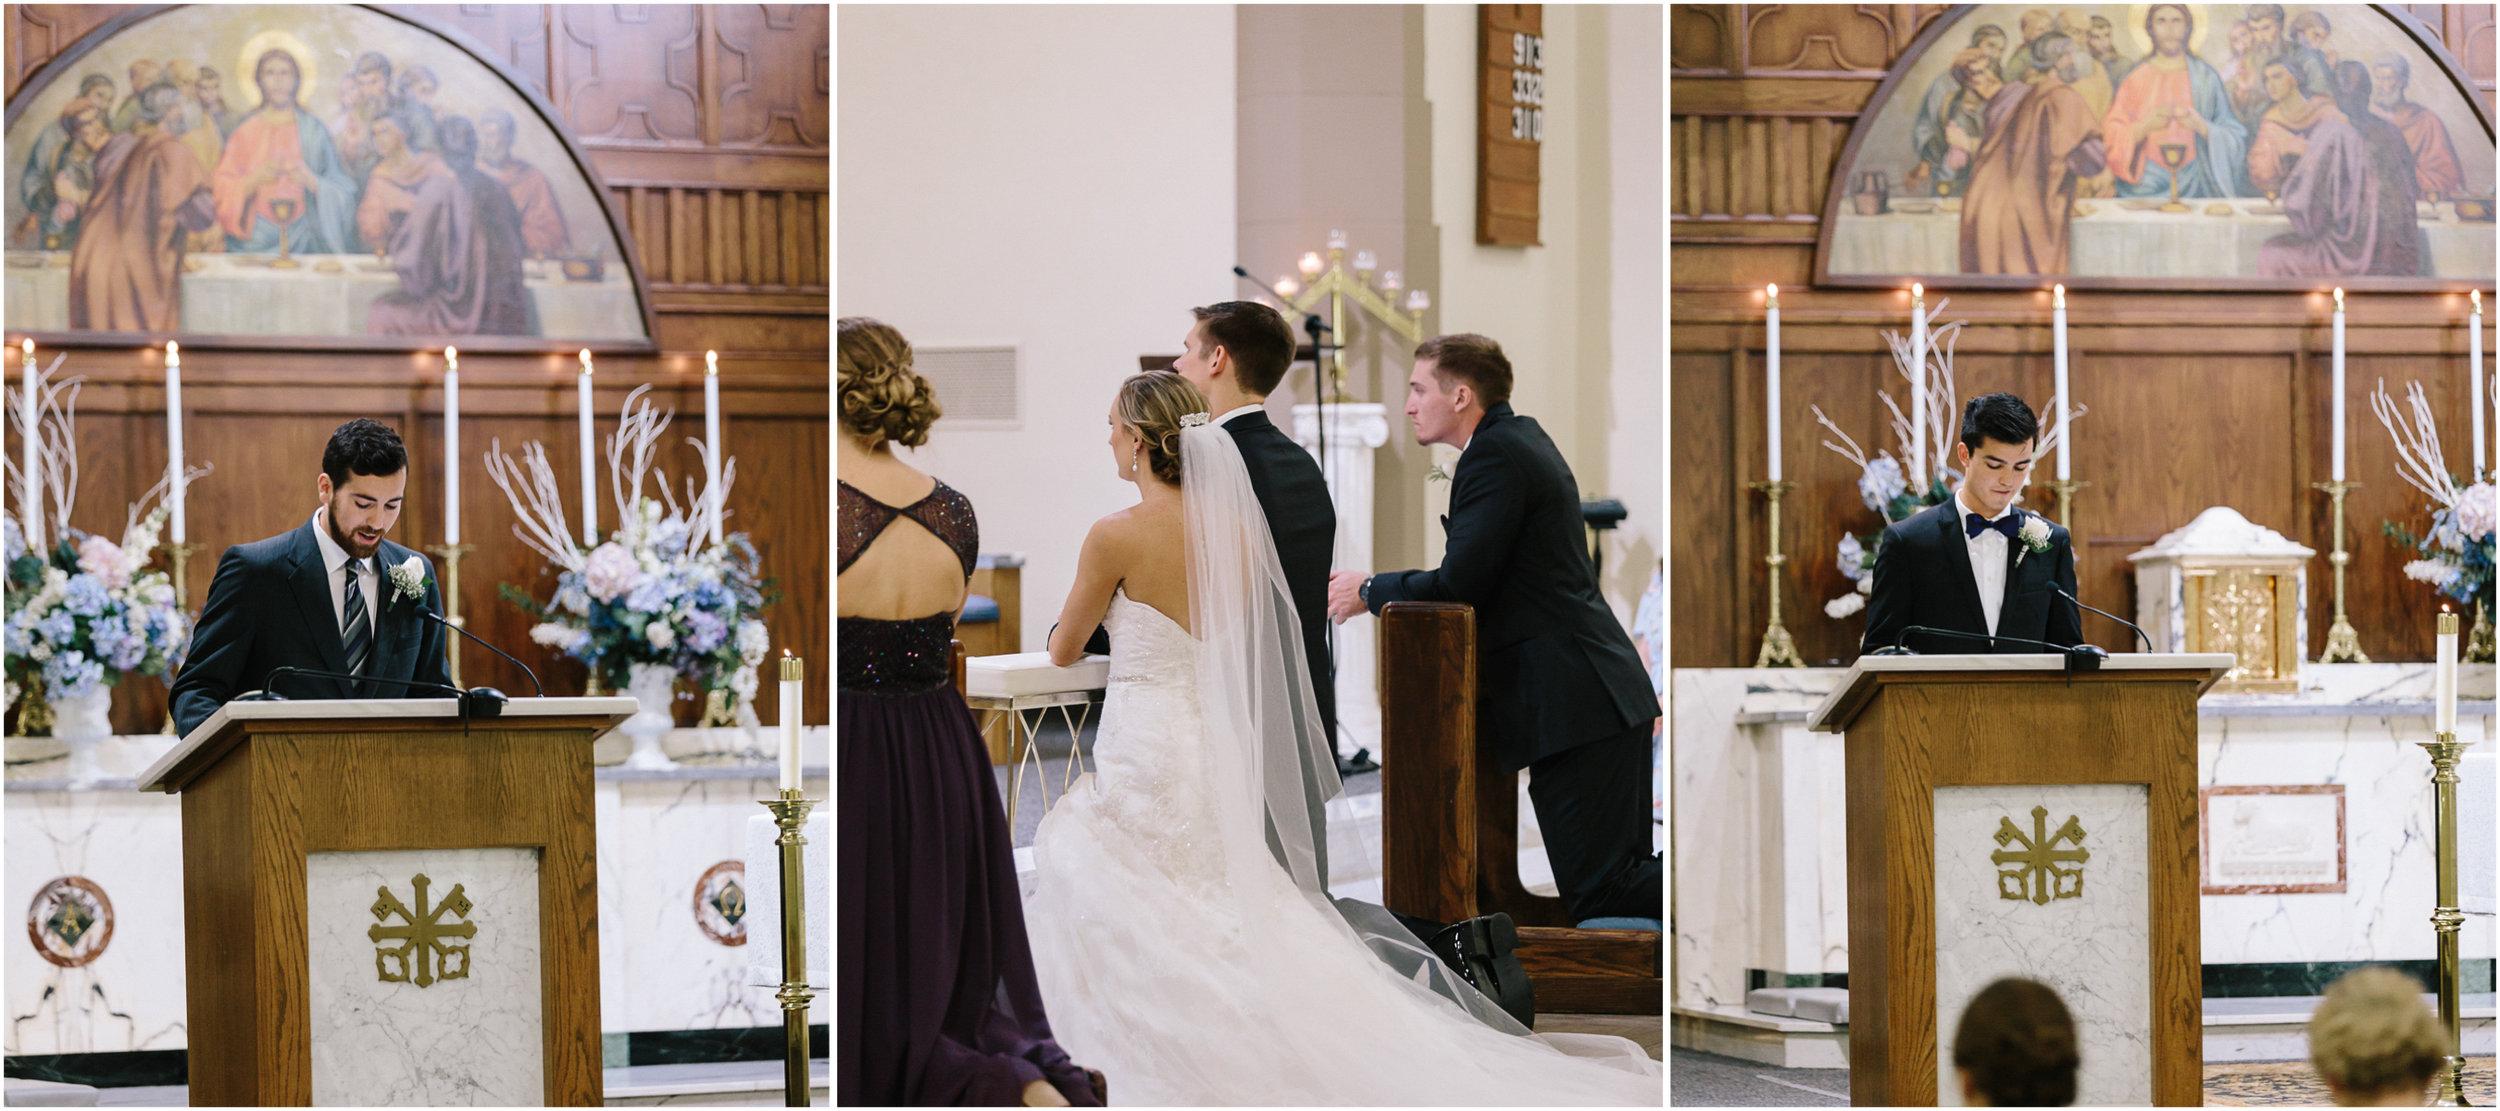 alyssa barletter photography kansas city wedding photographer katie and kendall-19.jpg